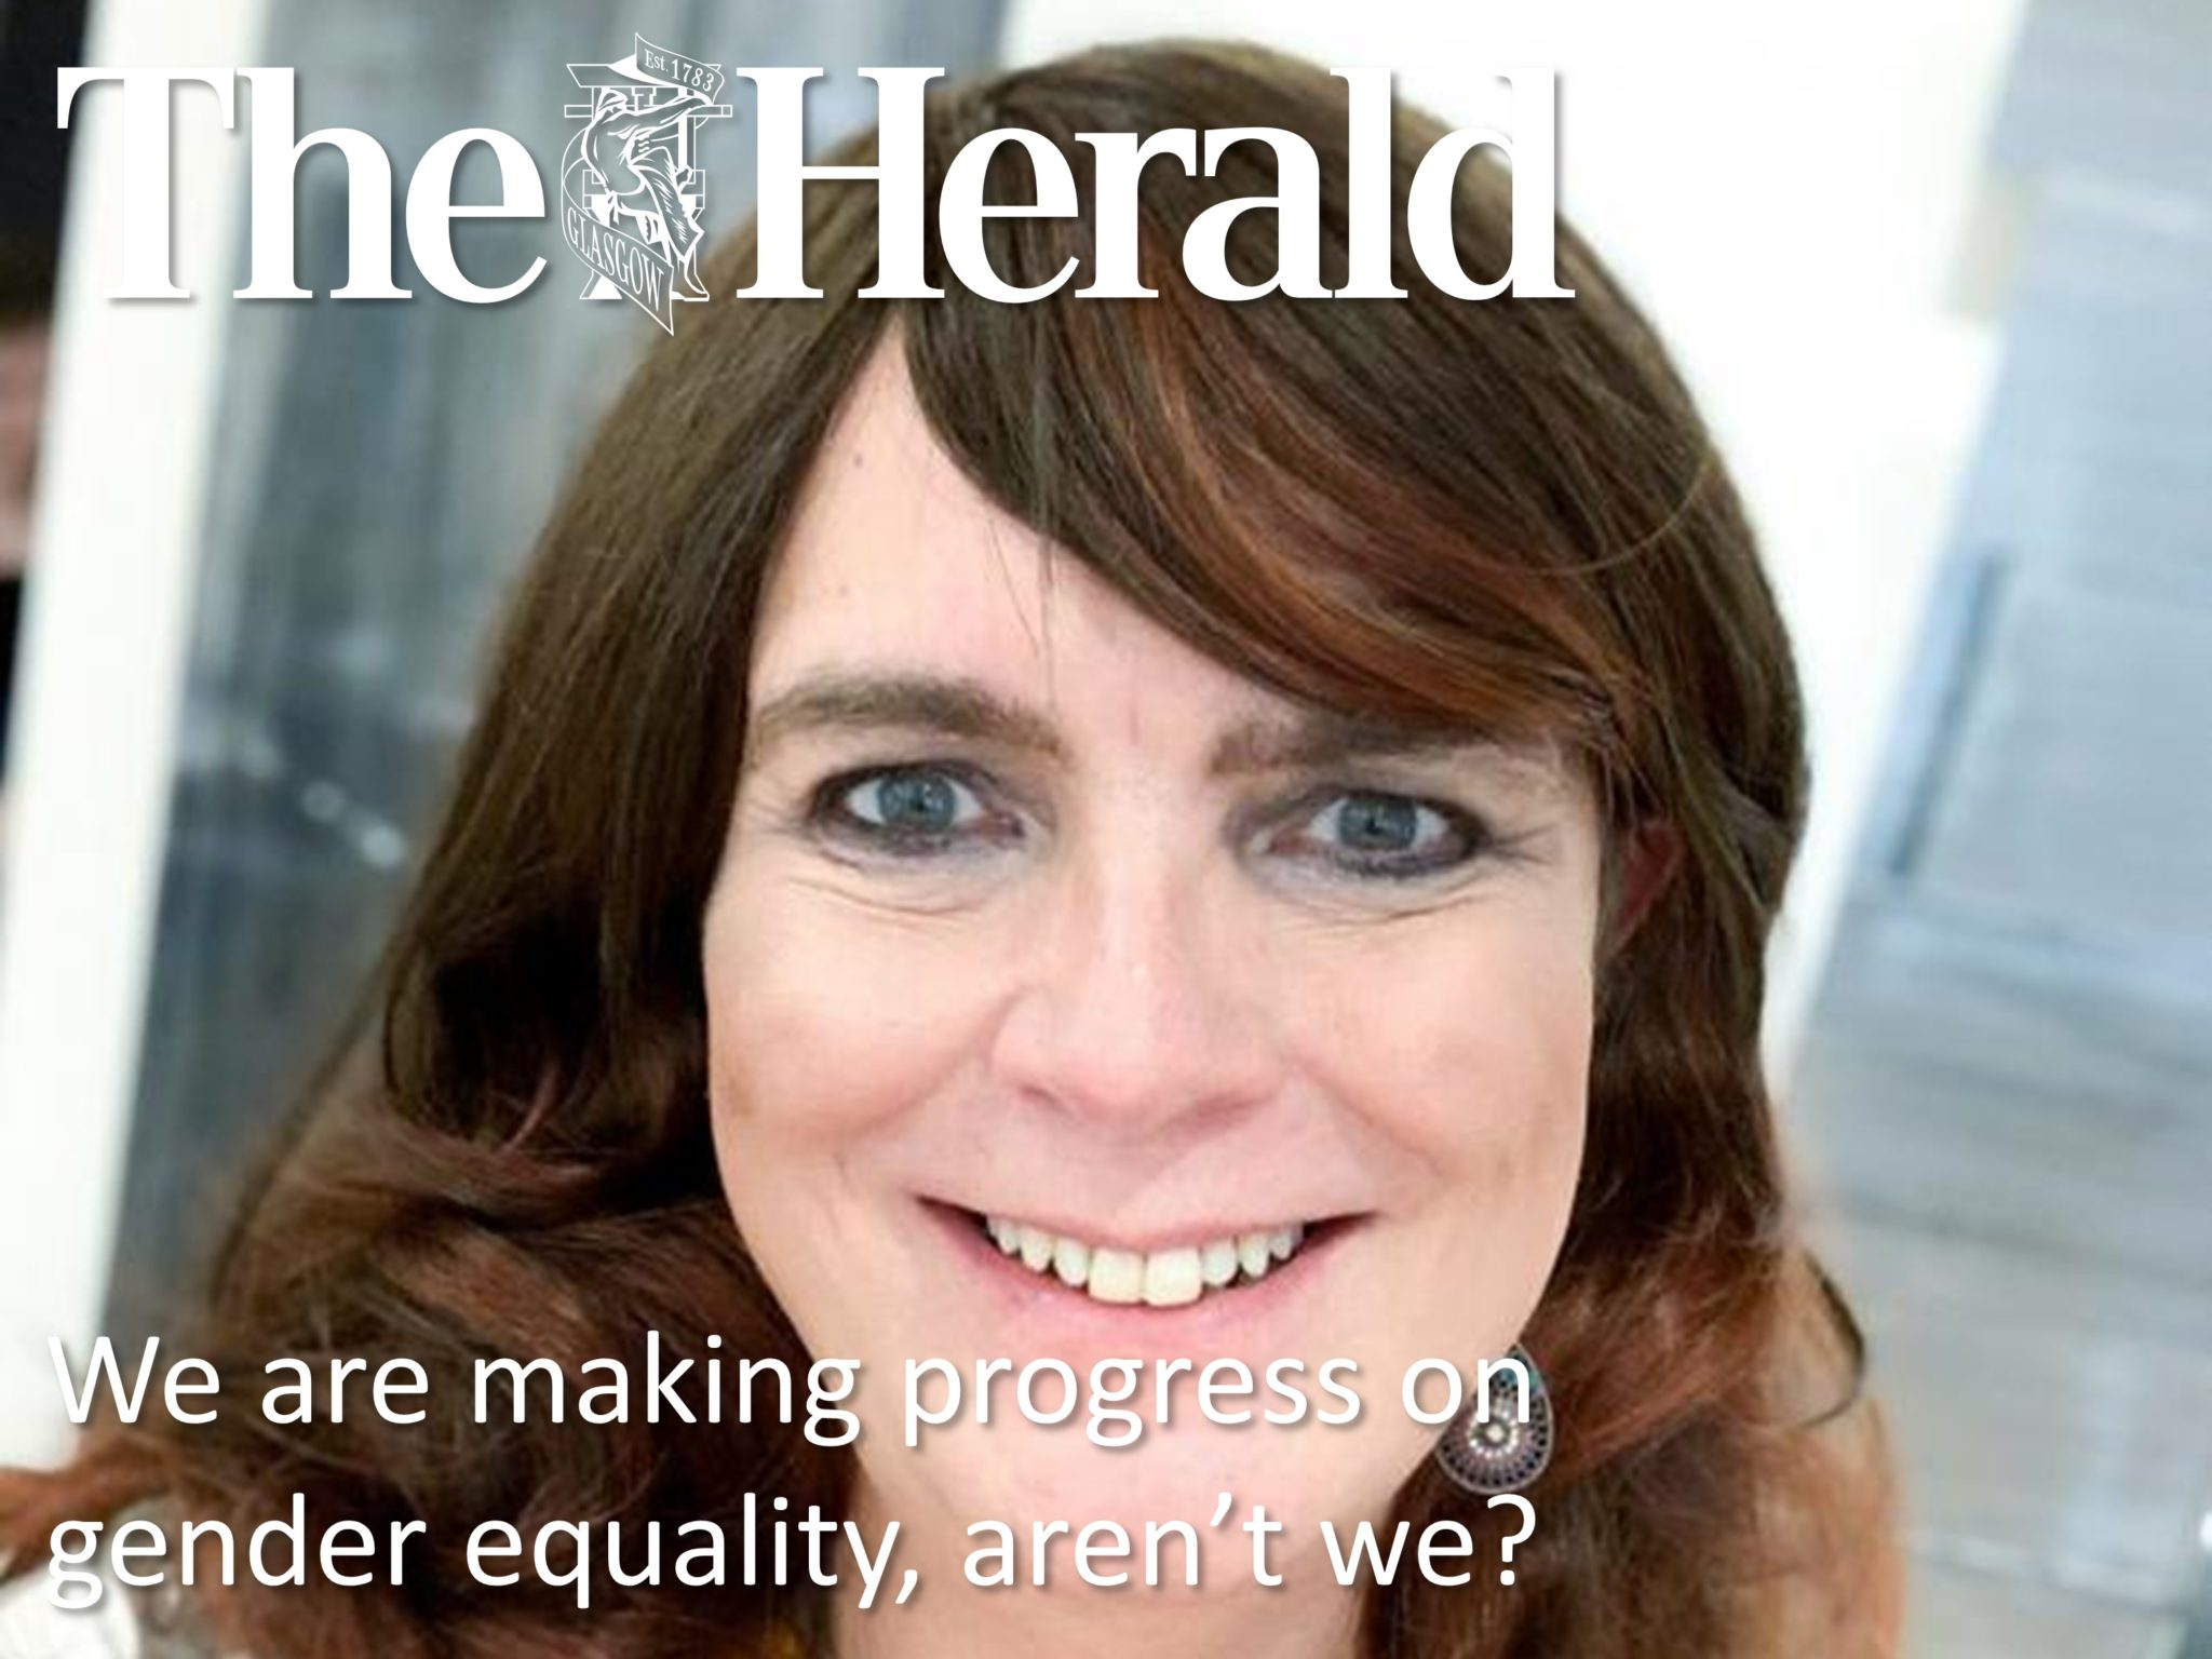 we-are-making-progress-on-gender-equality-arent-we